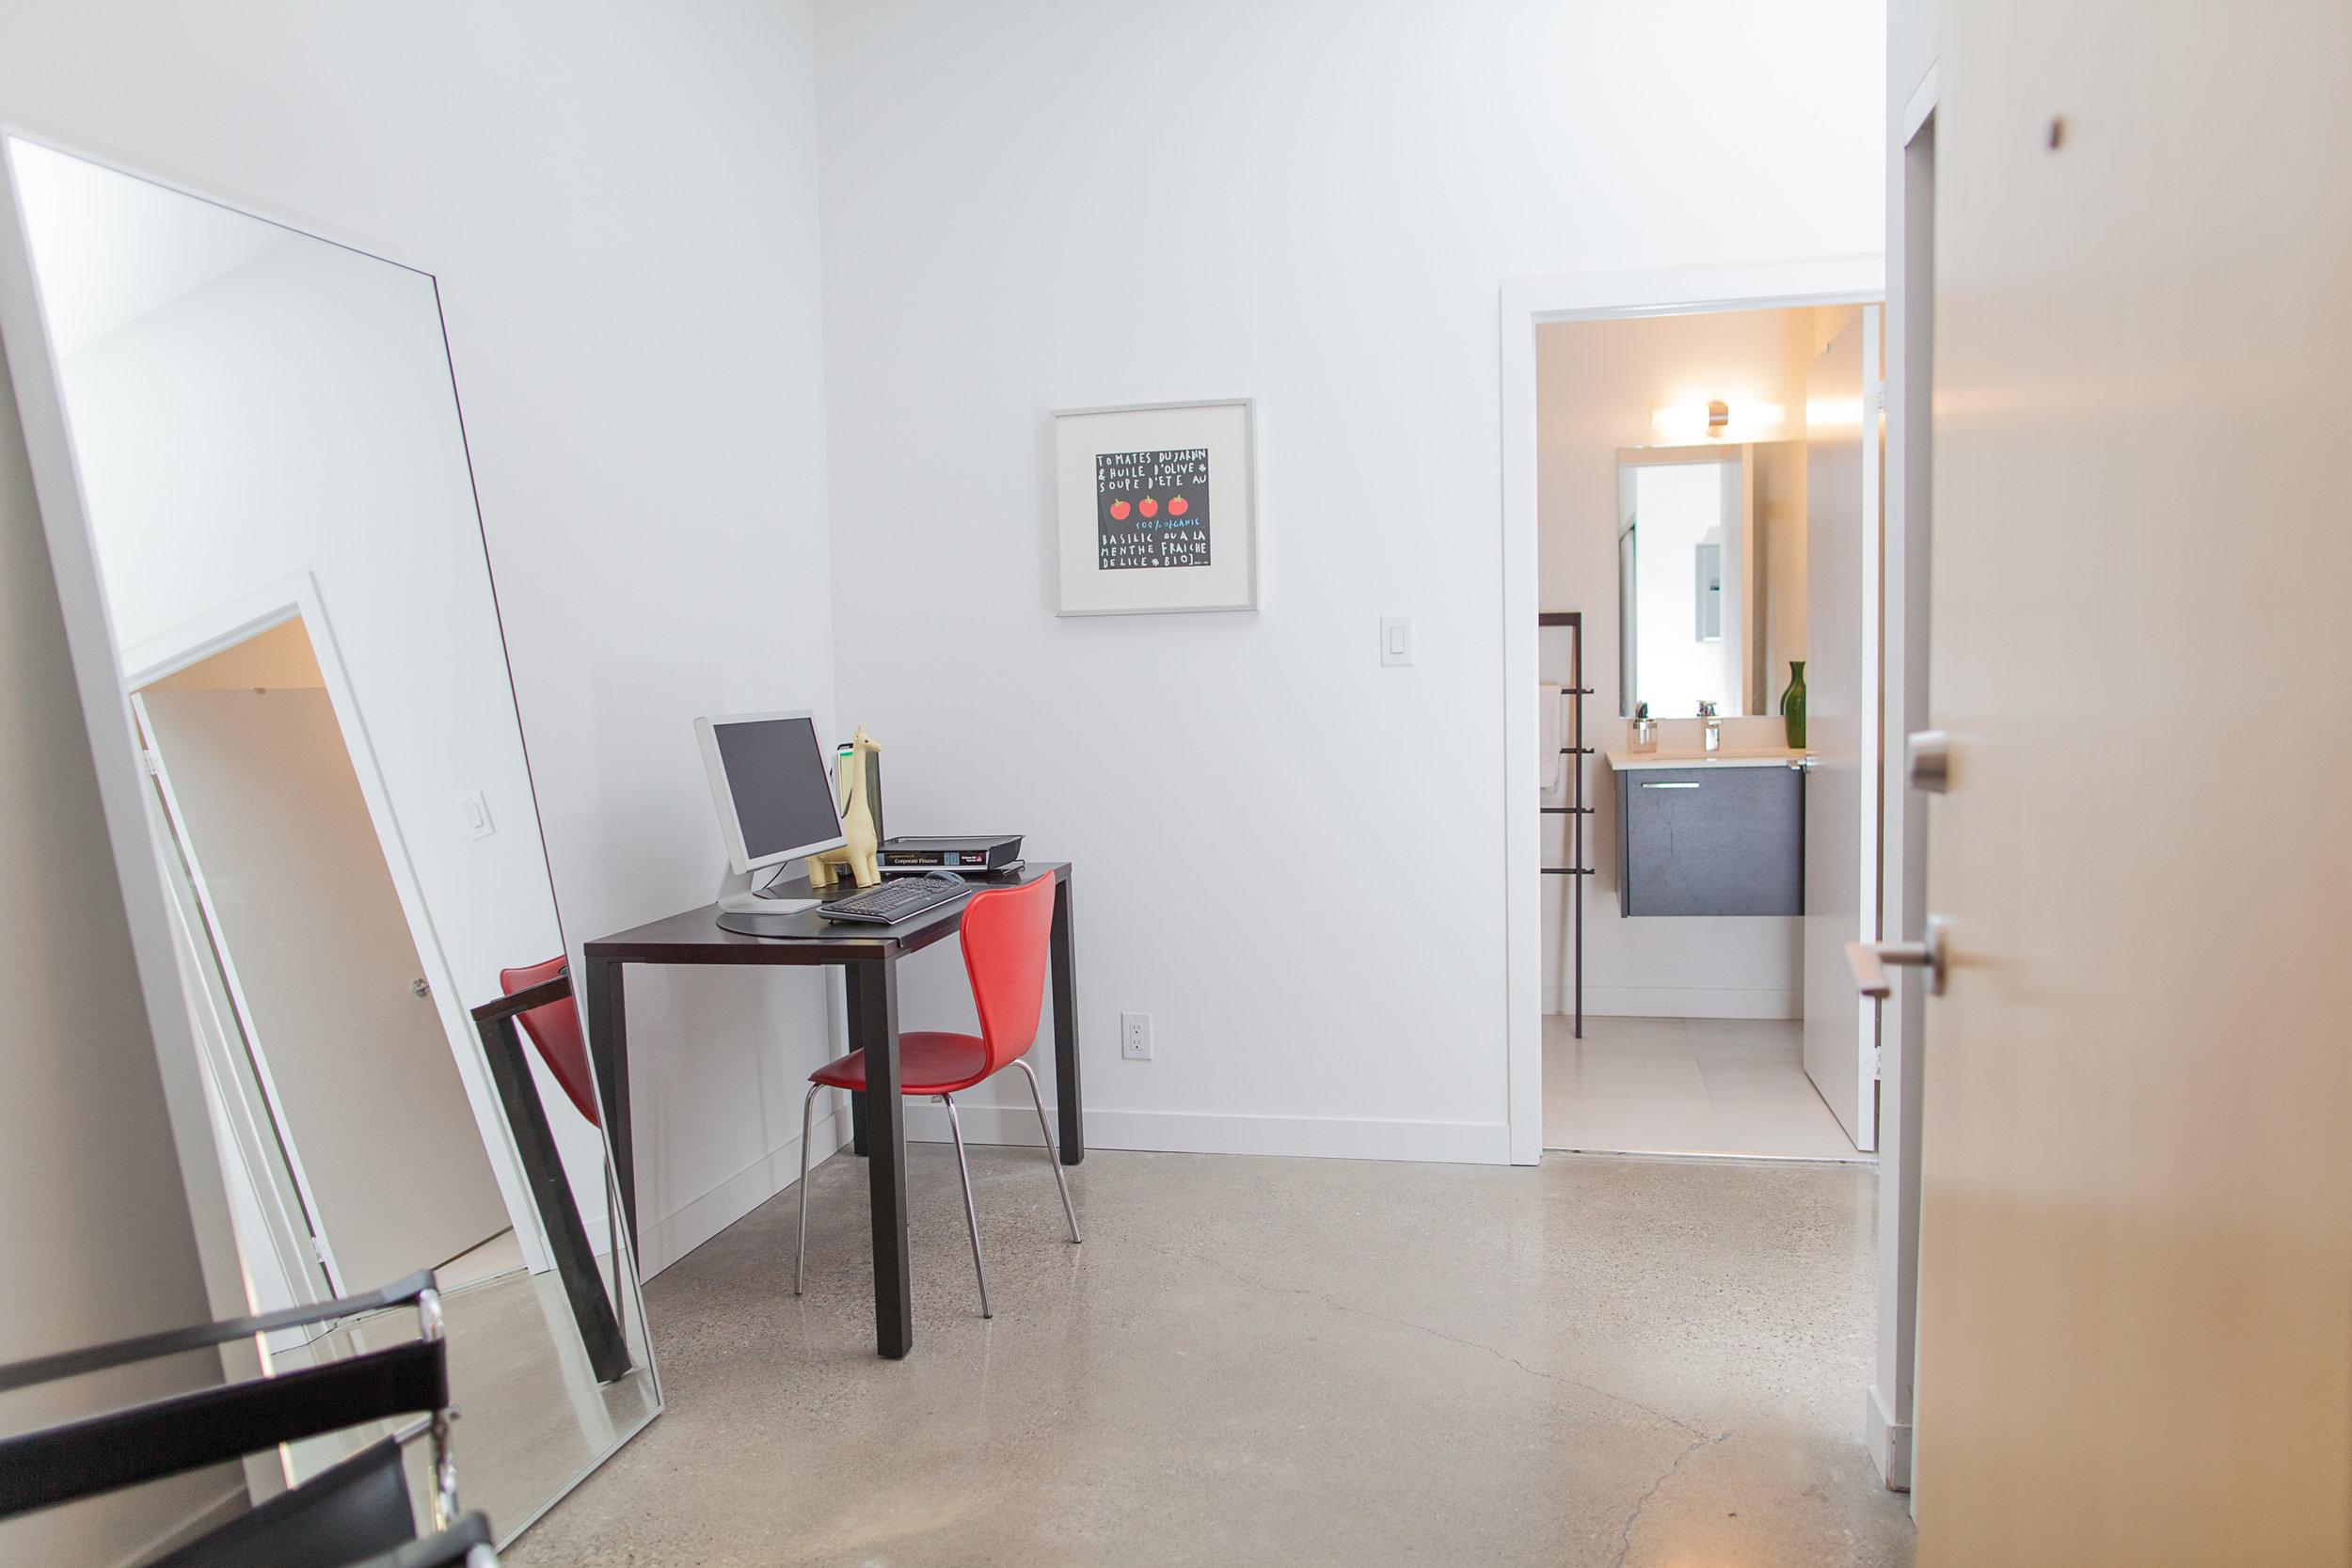 Entrance-Den-Guest Bathroom.jpg